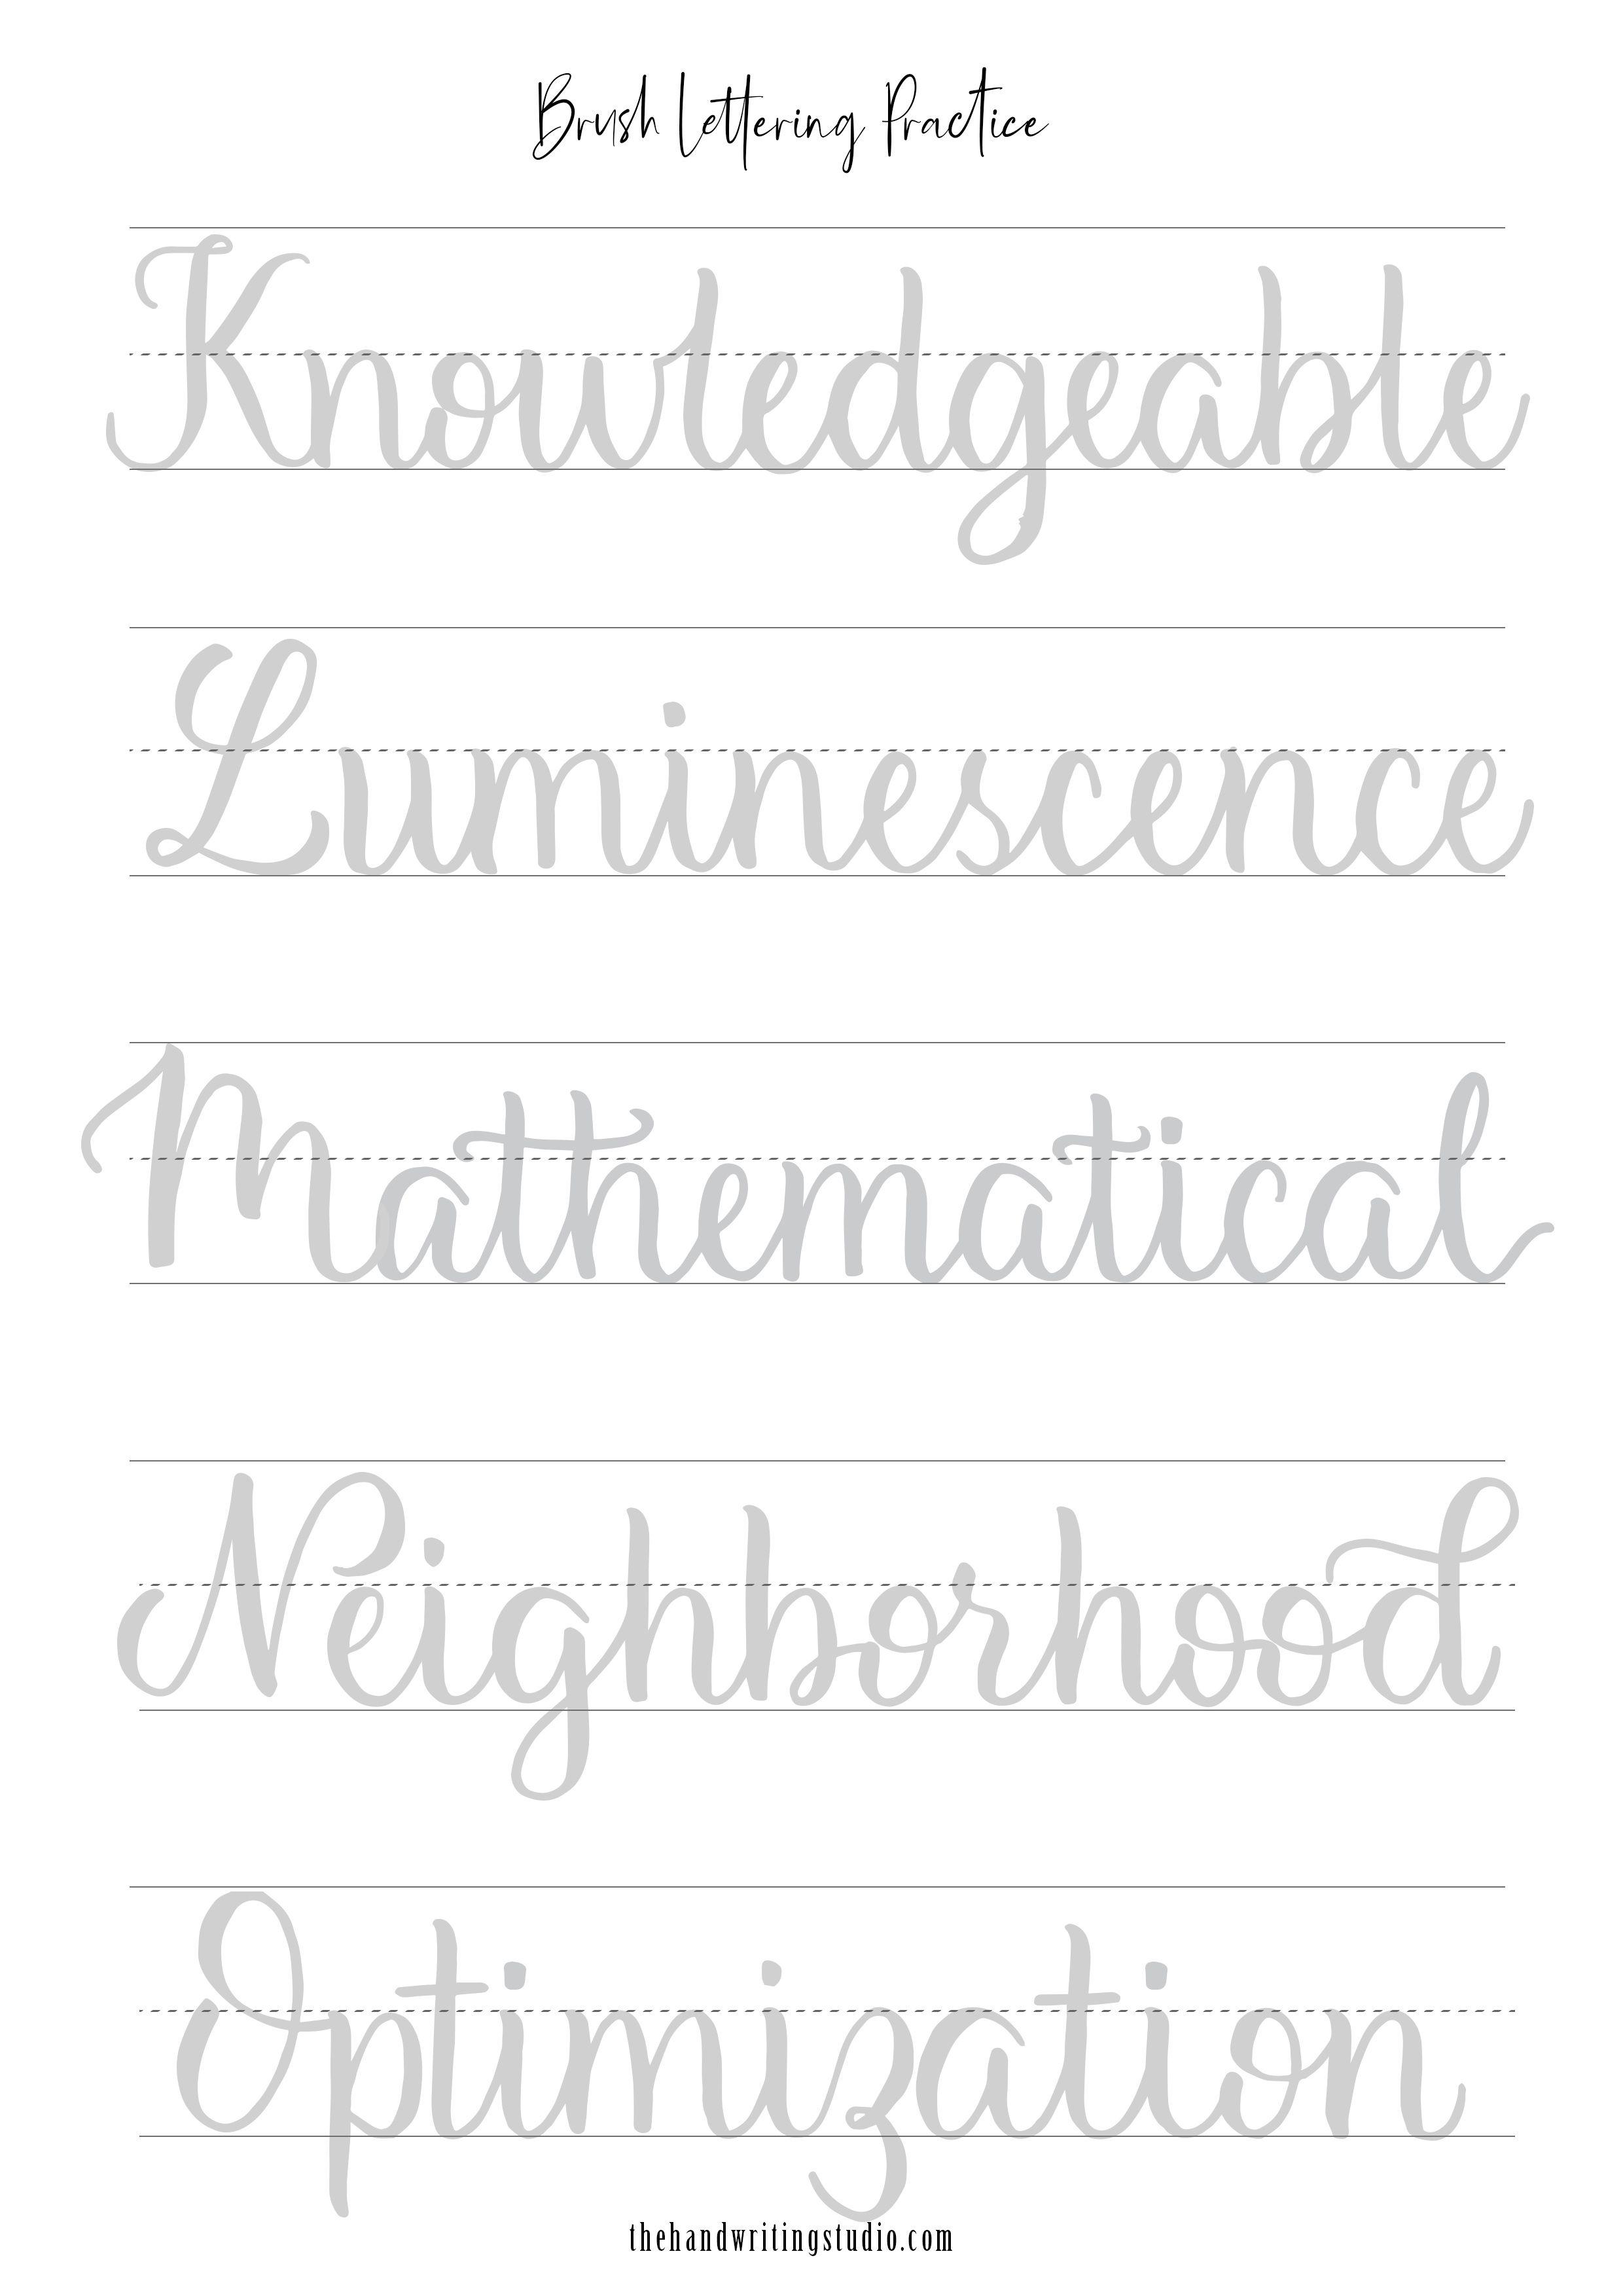 Brush Lettering Worksheets In